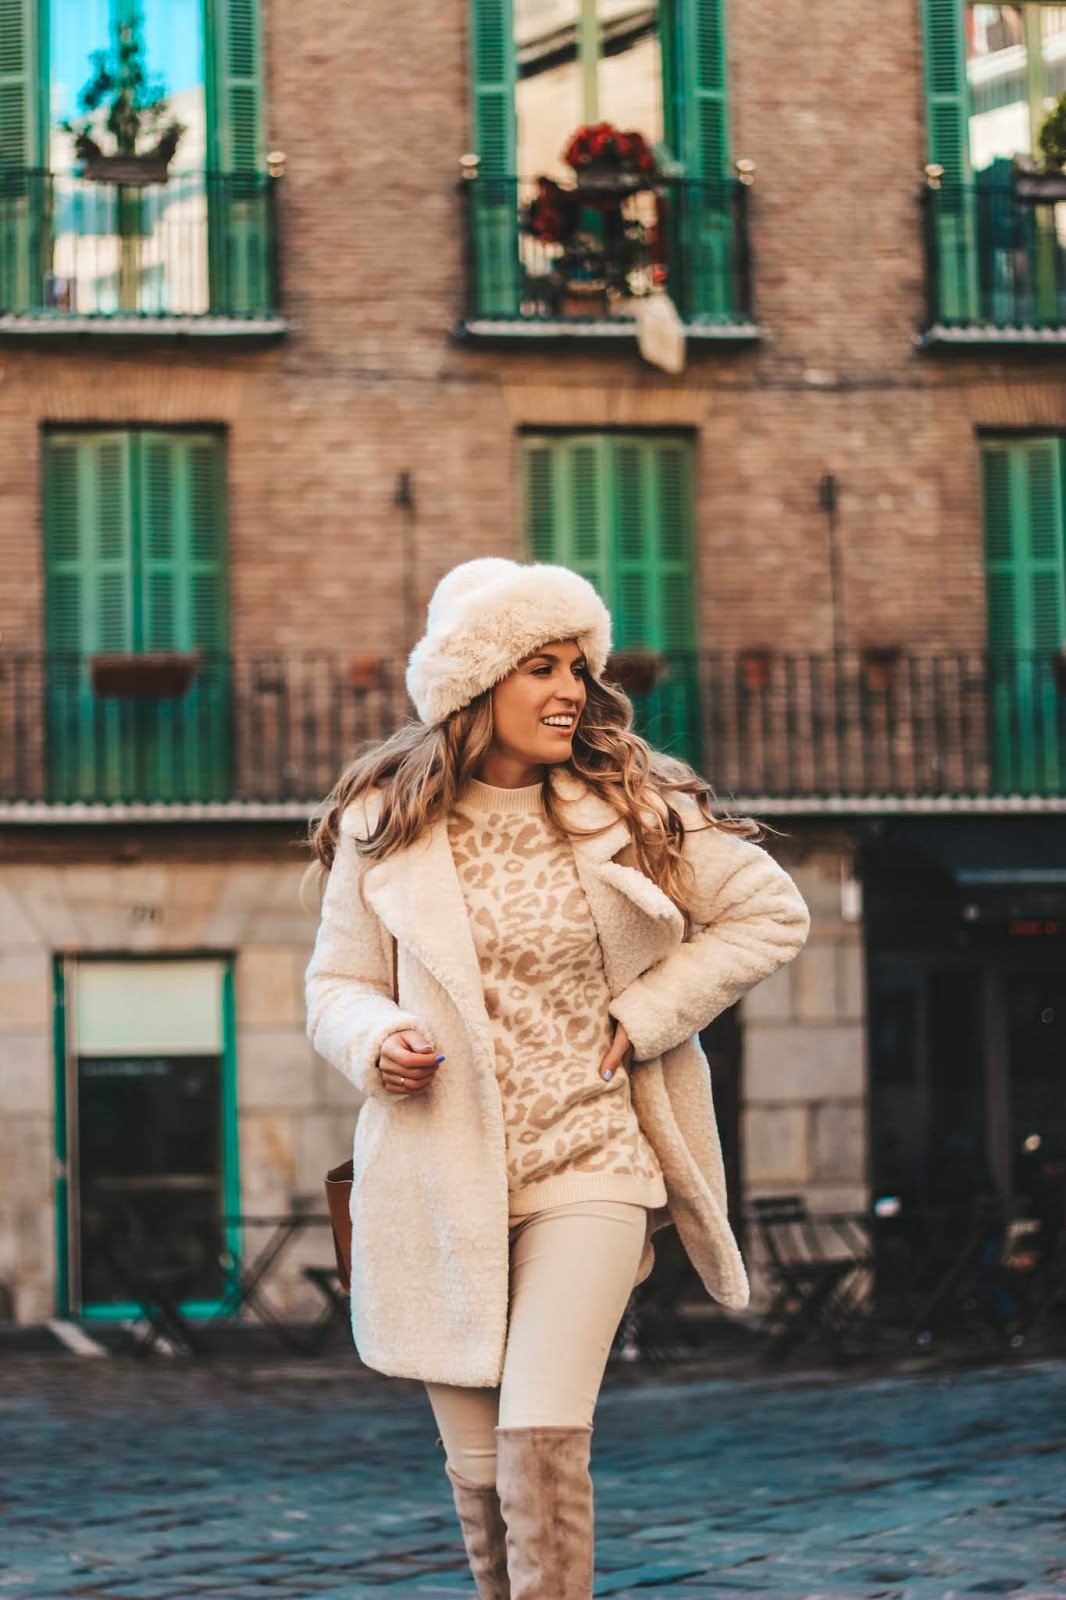 bloggers de moda Pamplona